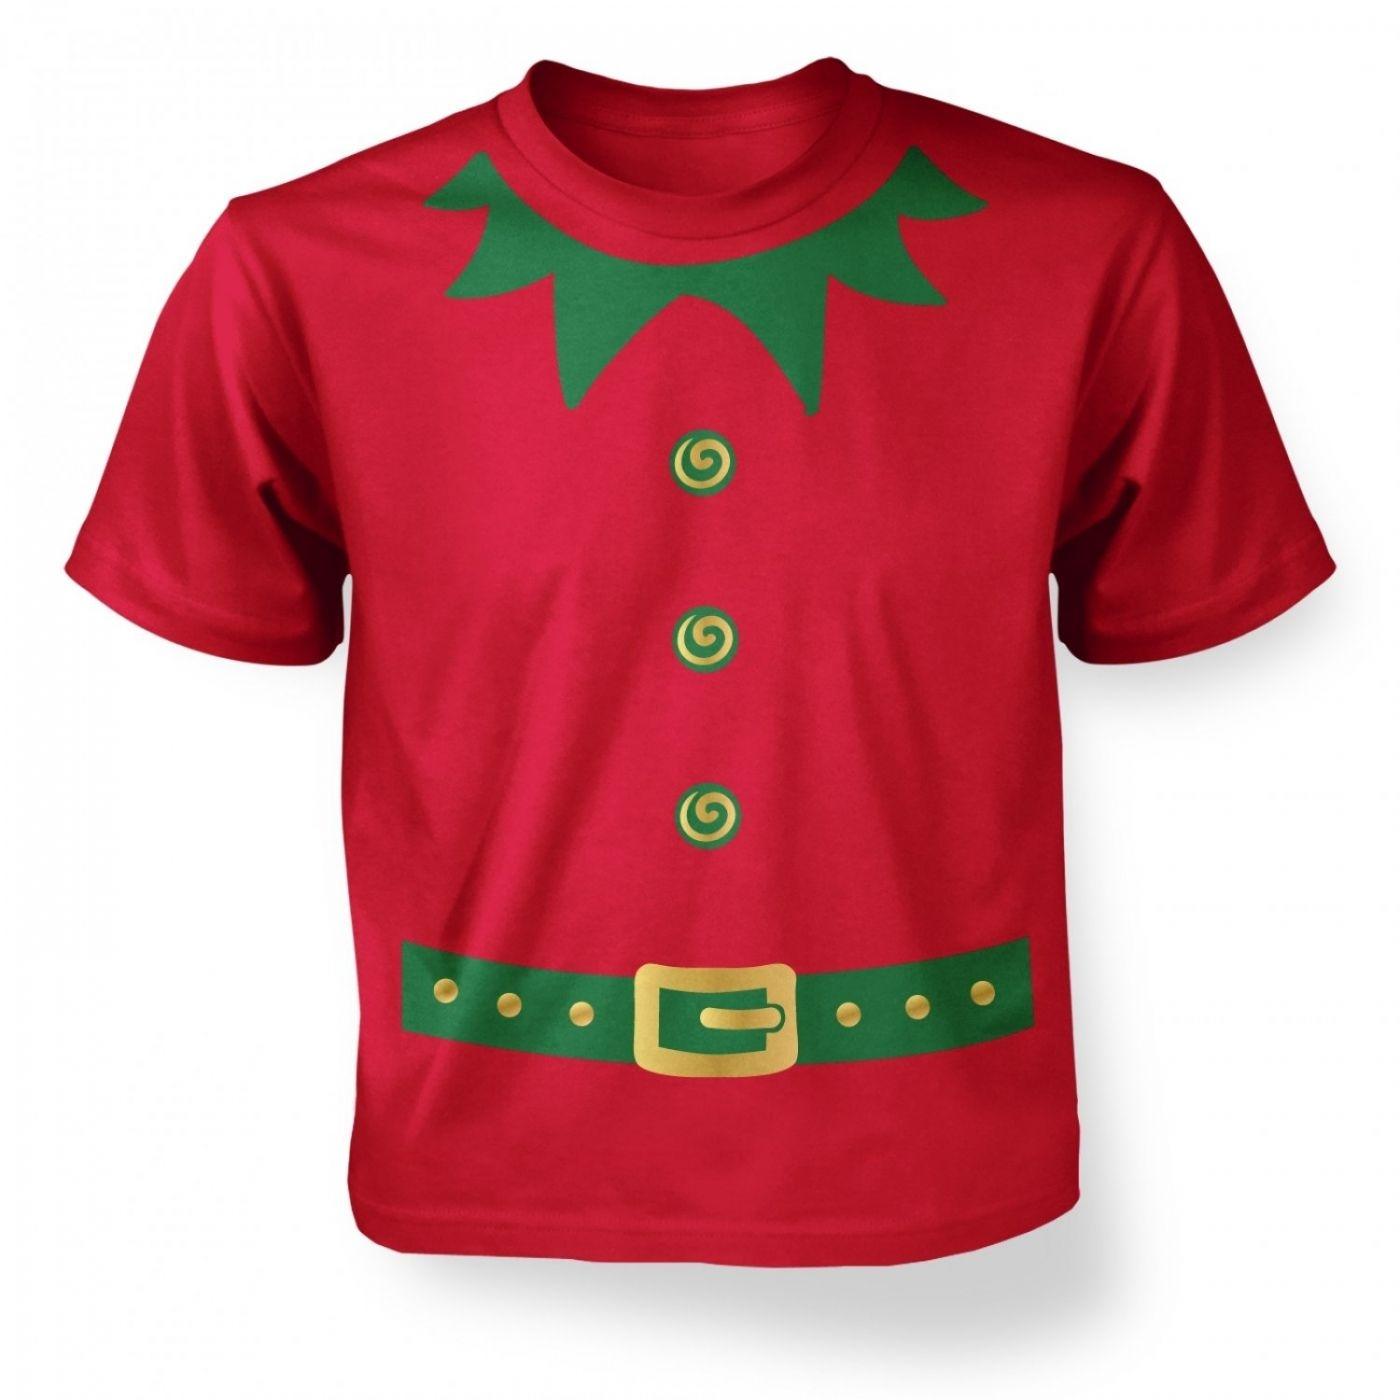 Christmas Elf Costume green detail kids t shirt Somethinggeeky